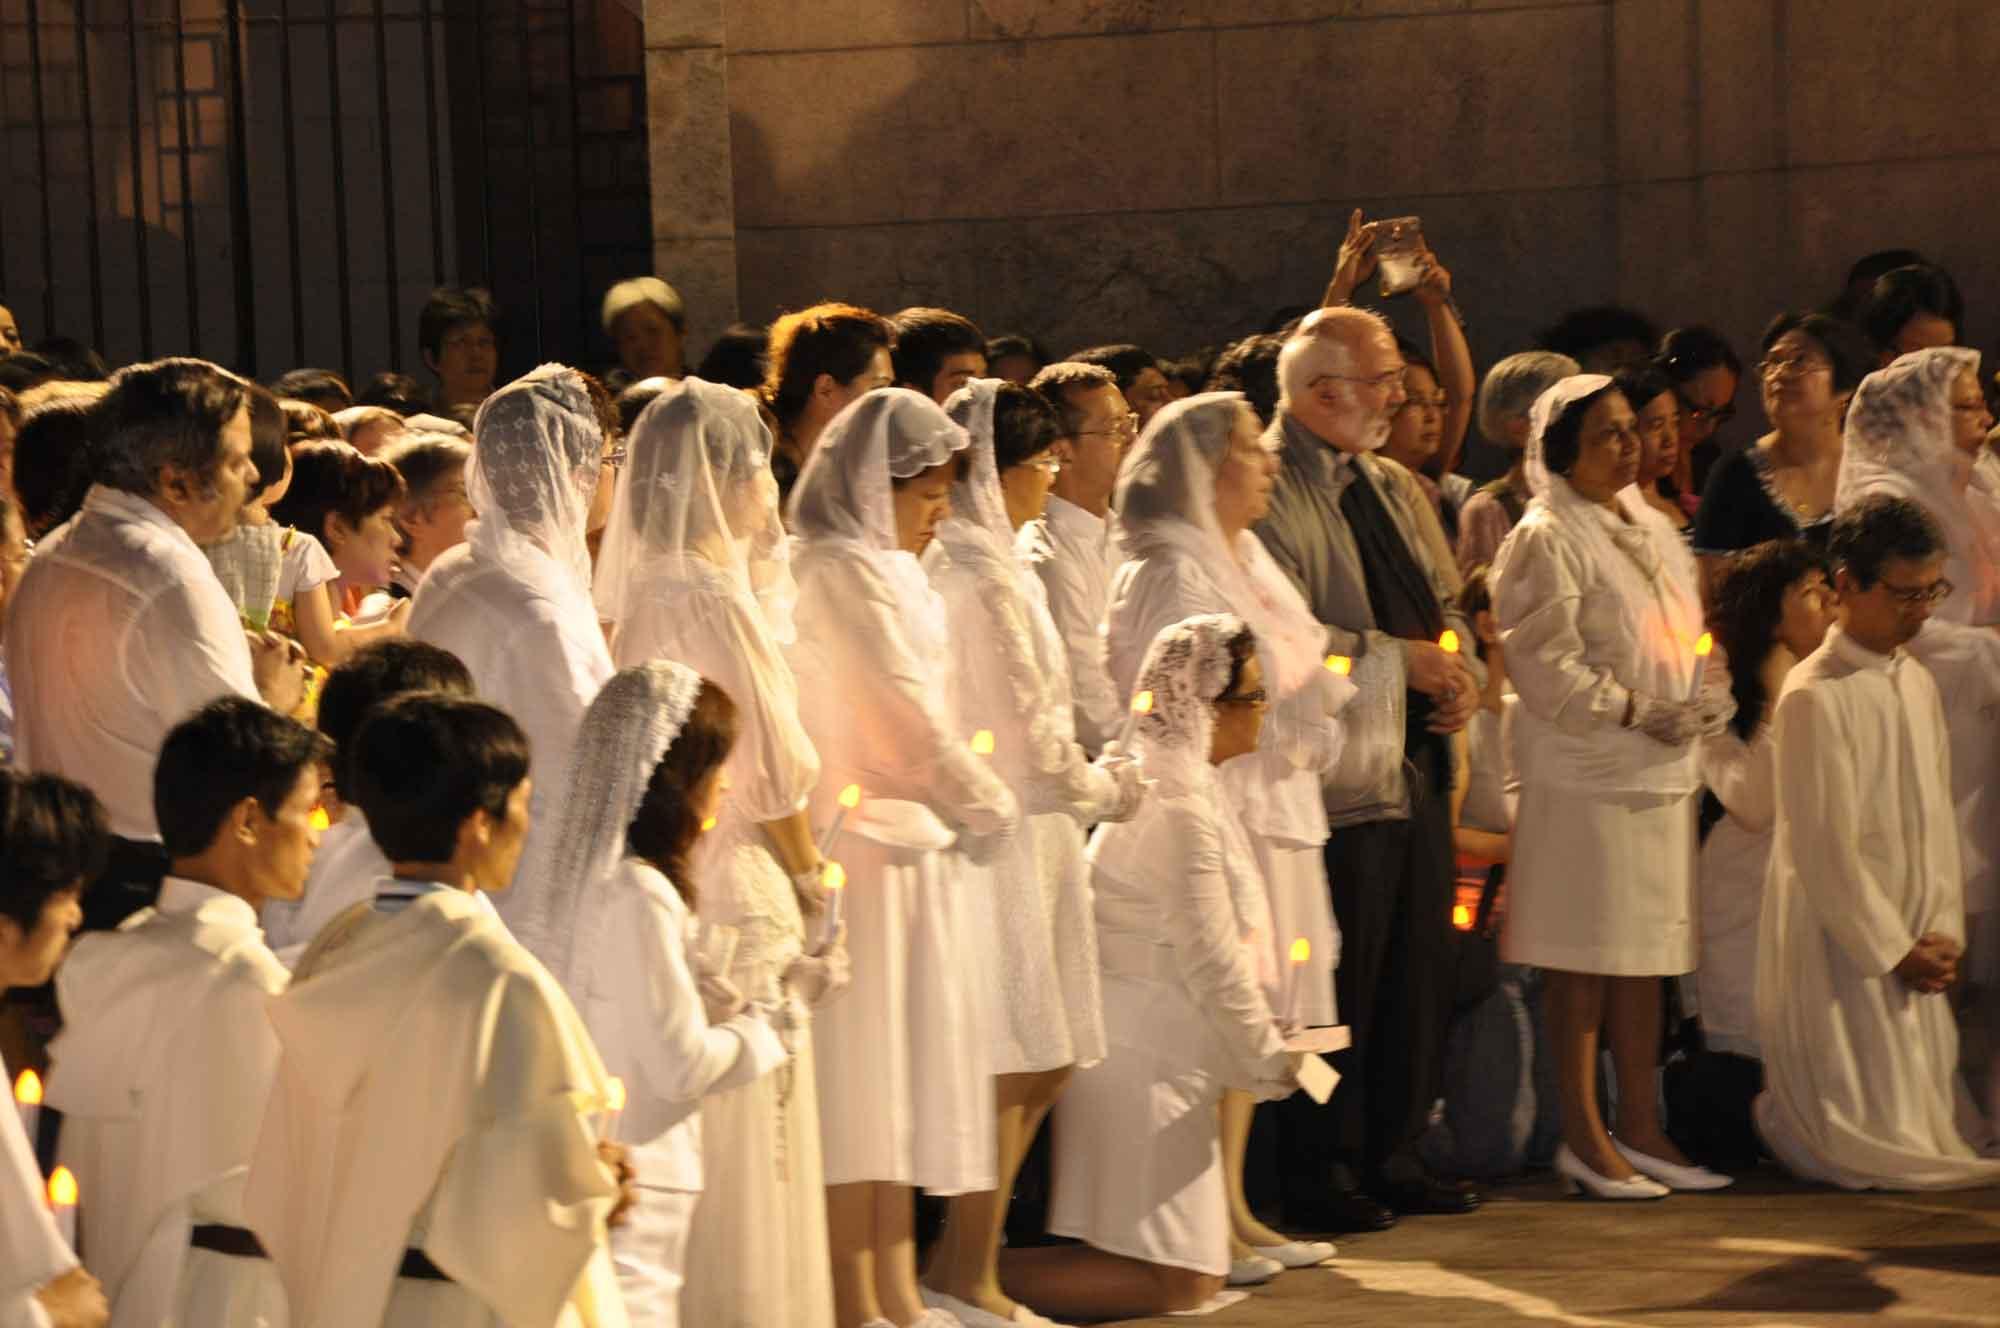 Macau's Our Lady of Fatima Procession at Penha Church service